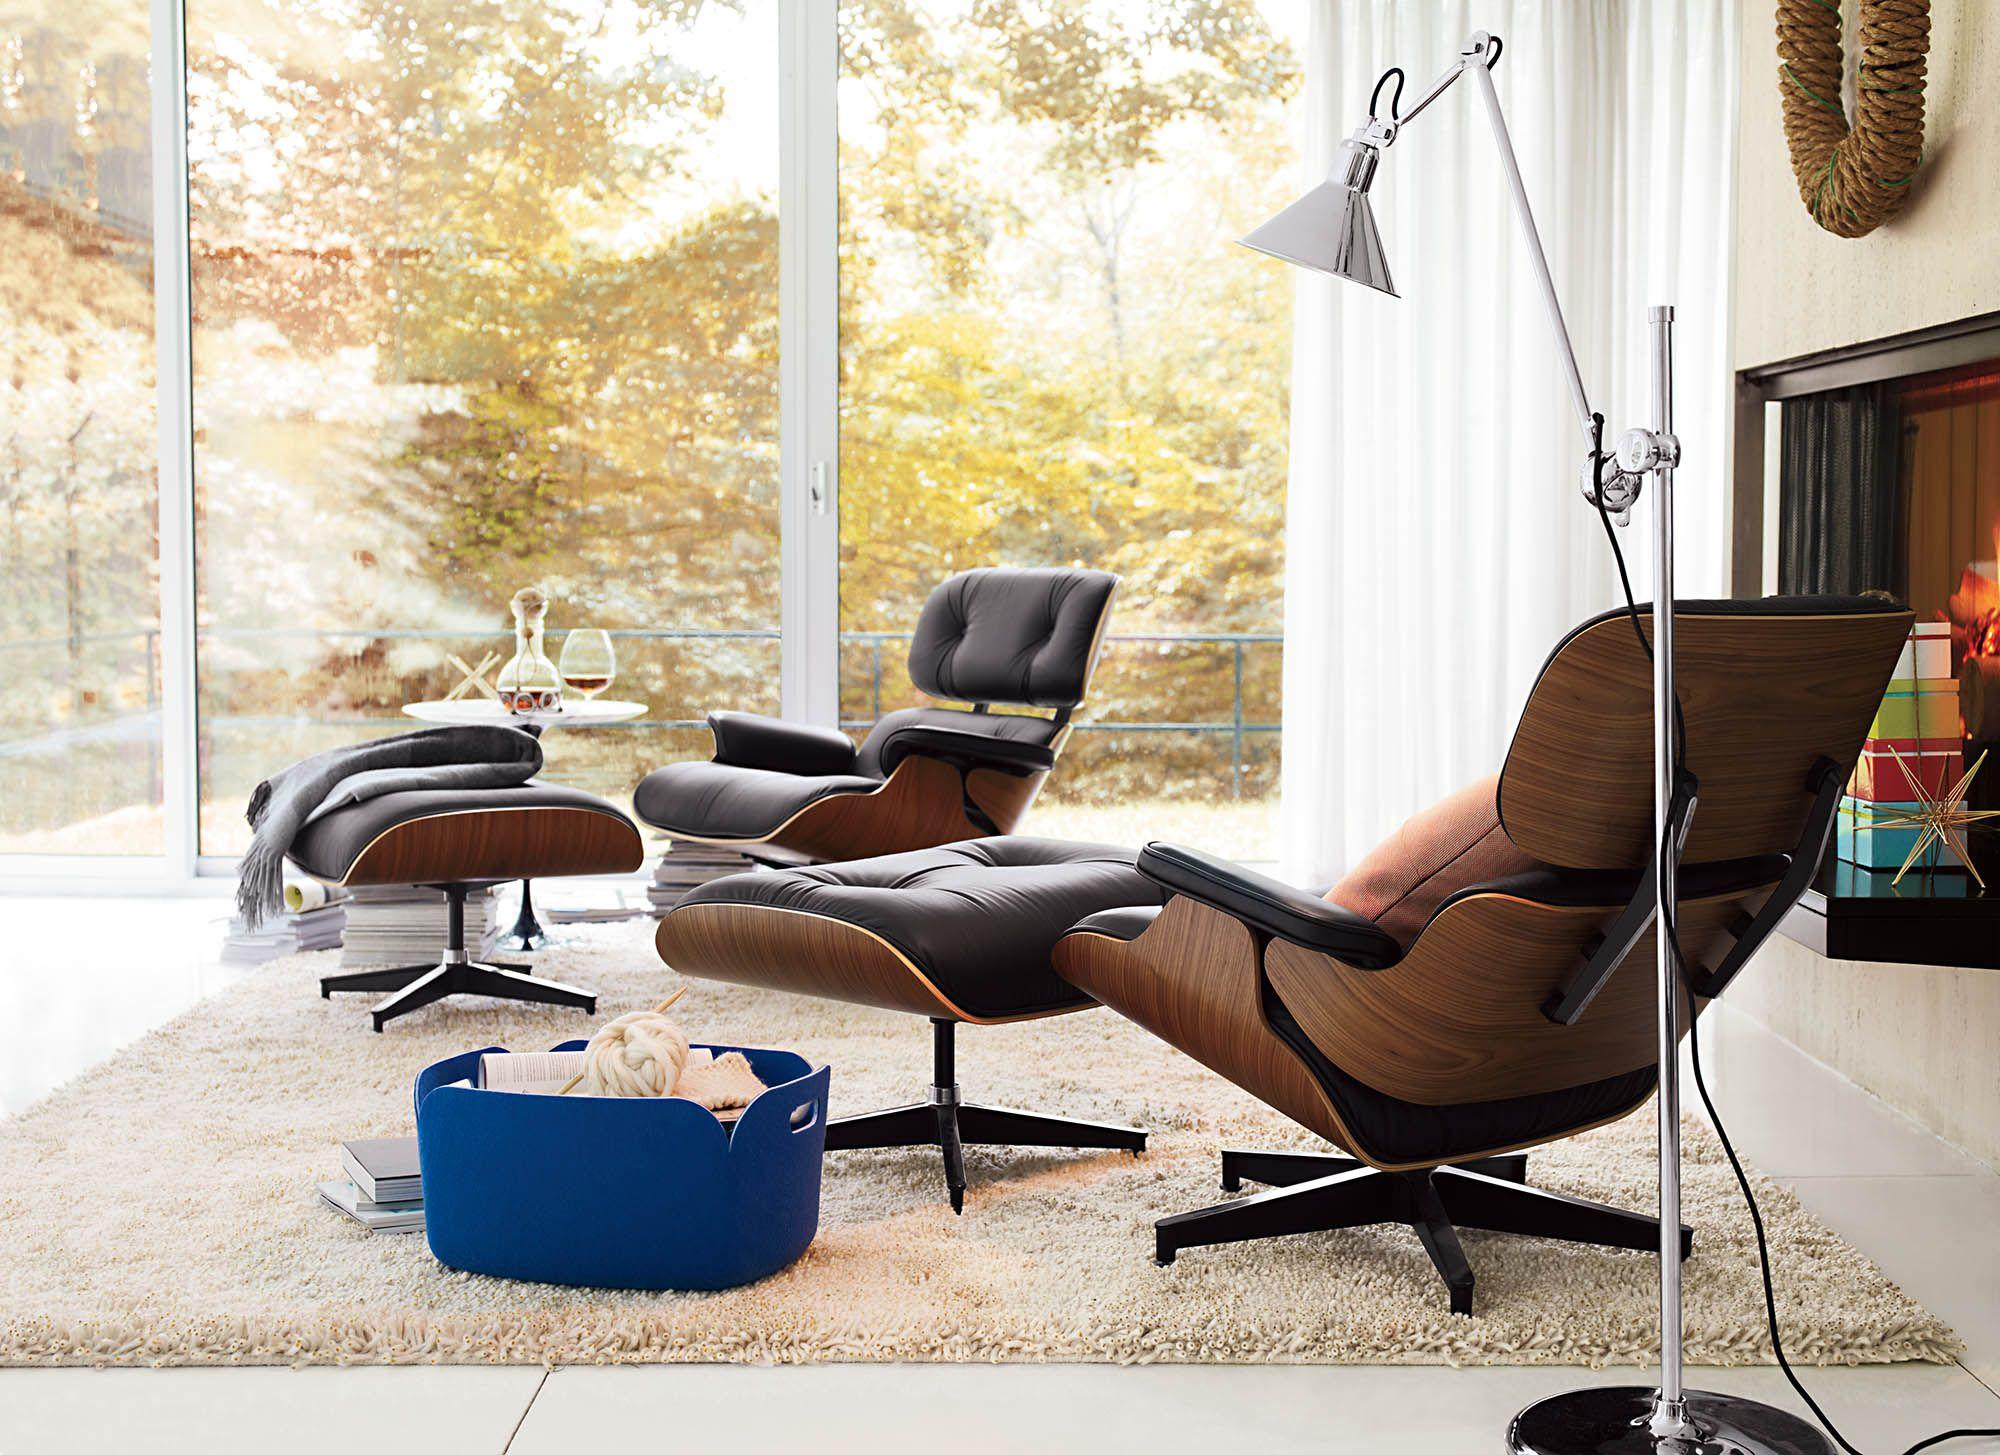 Restore Basket, Medium Eames style lounge chair, Eames